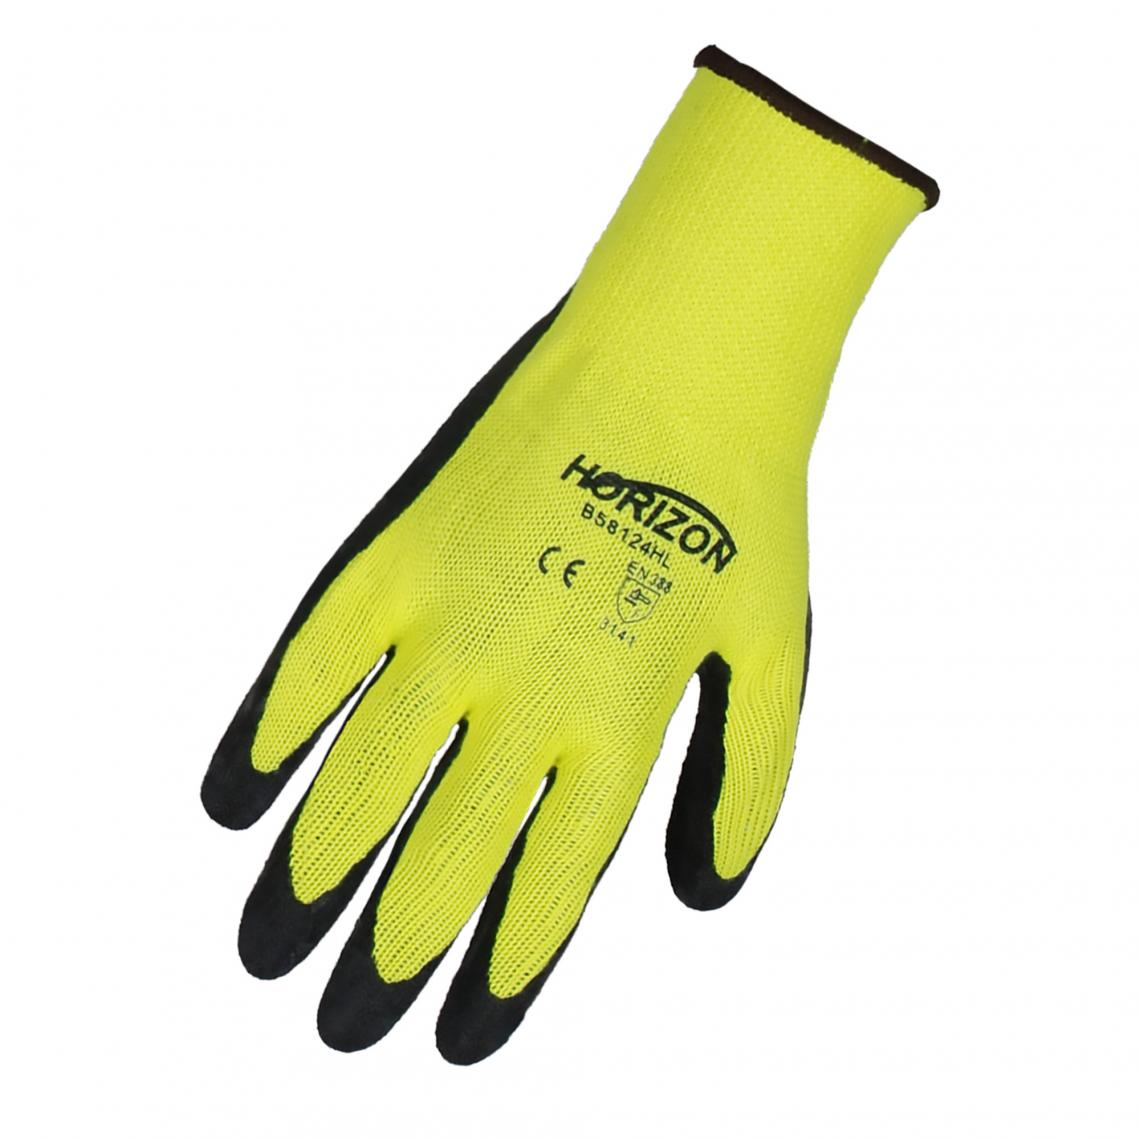 Gloves - Horizon Hi-Vis Latex Coated Glove - YL- L